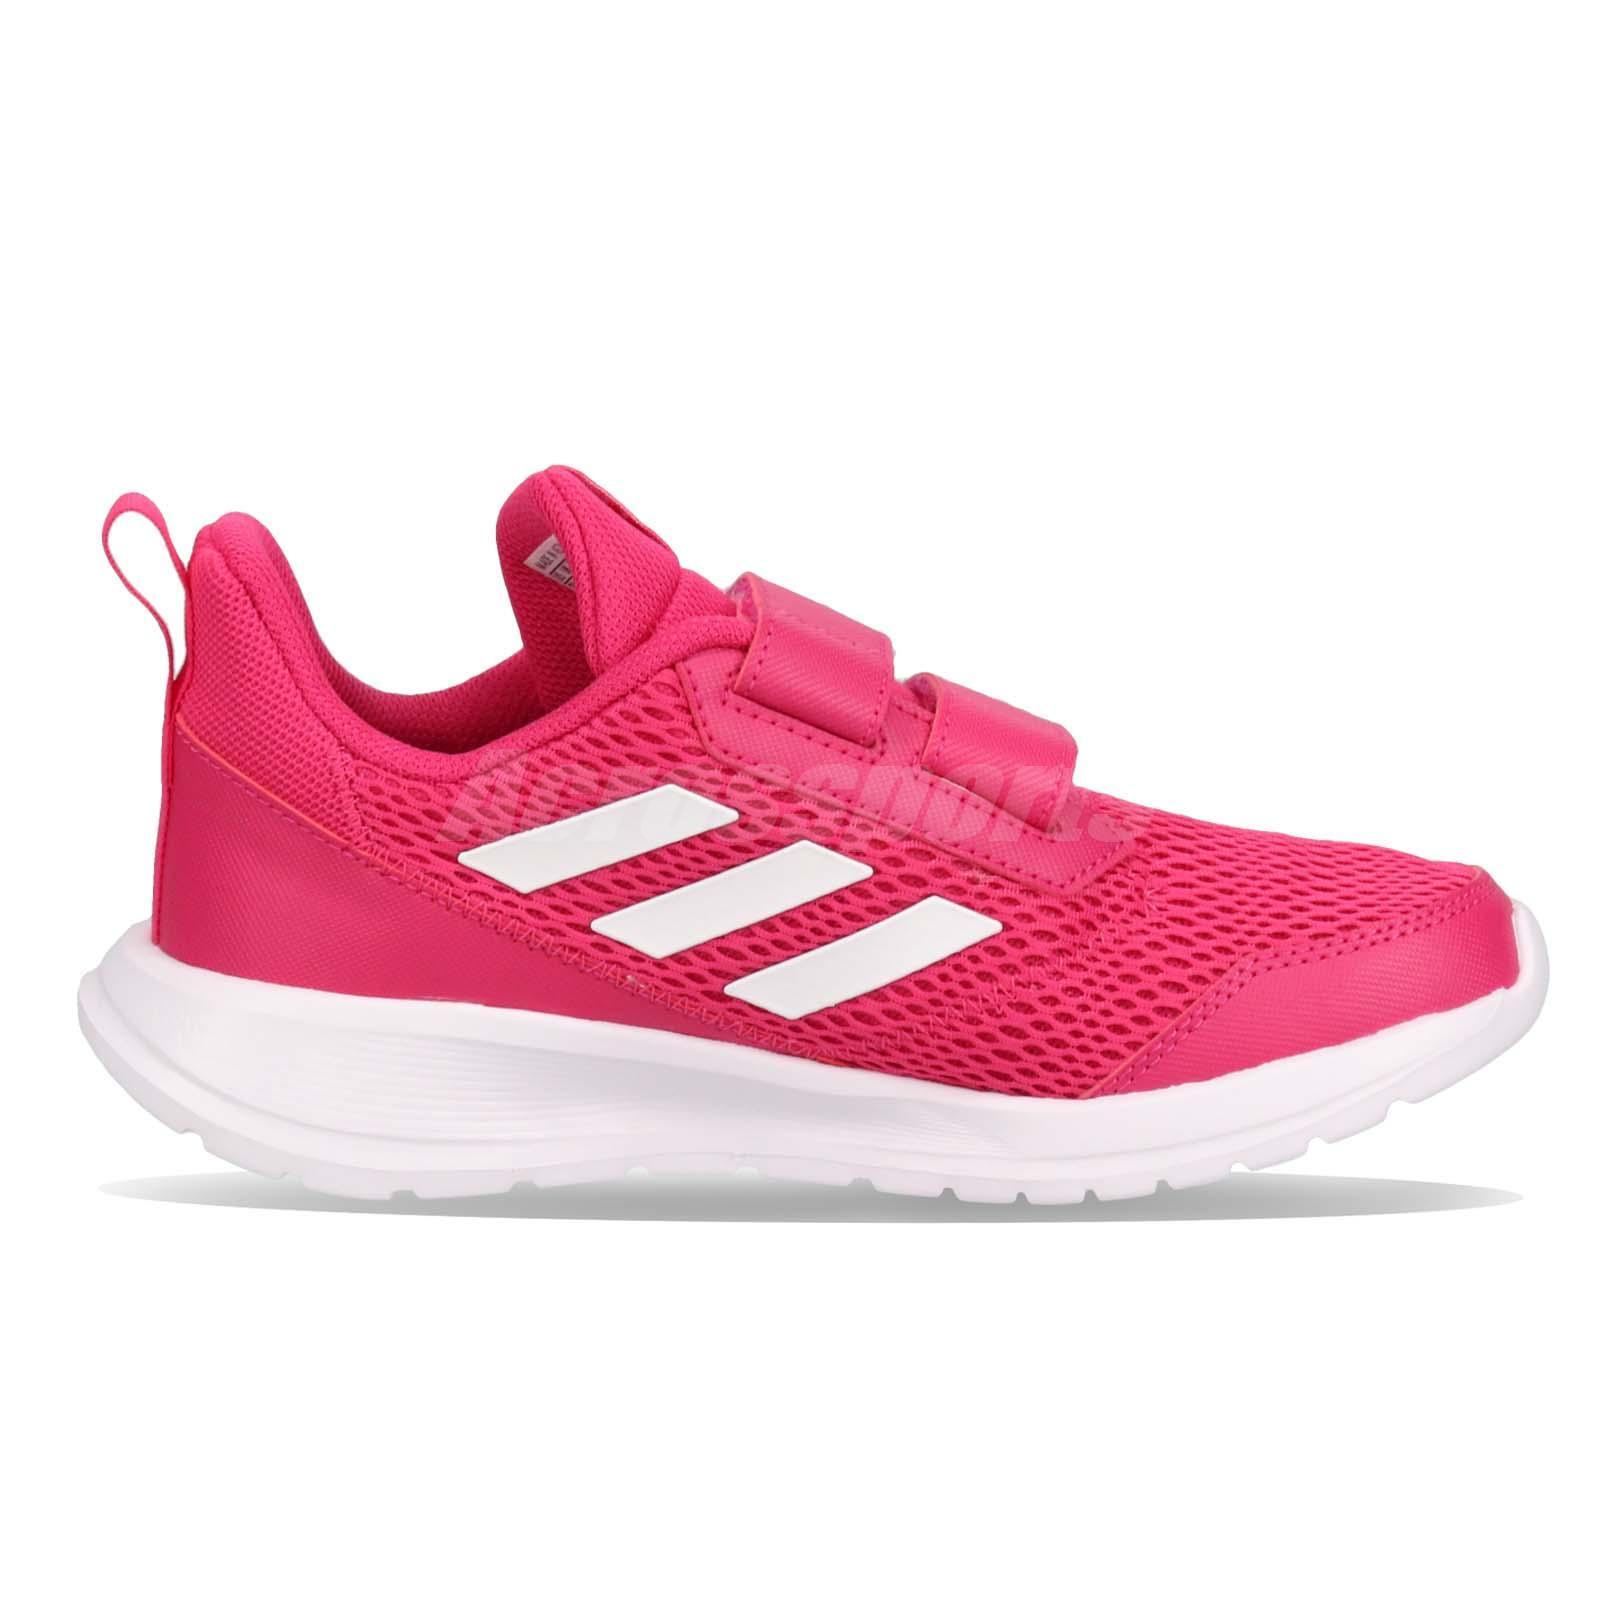 2adidas altarun k scarpe running donna